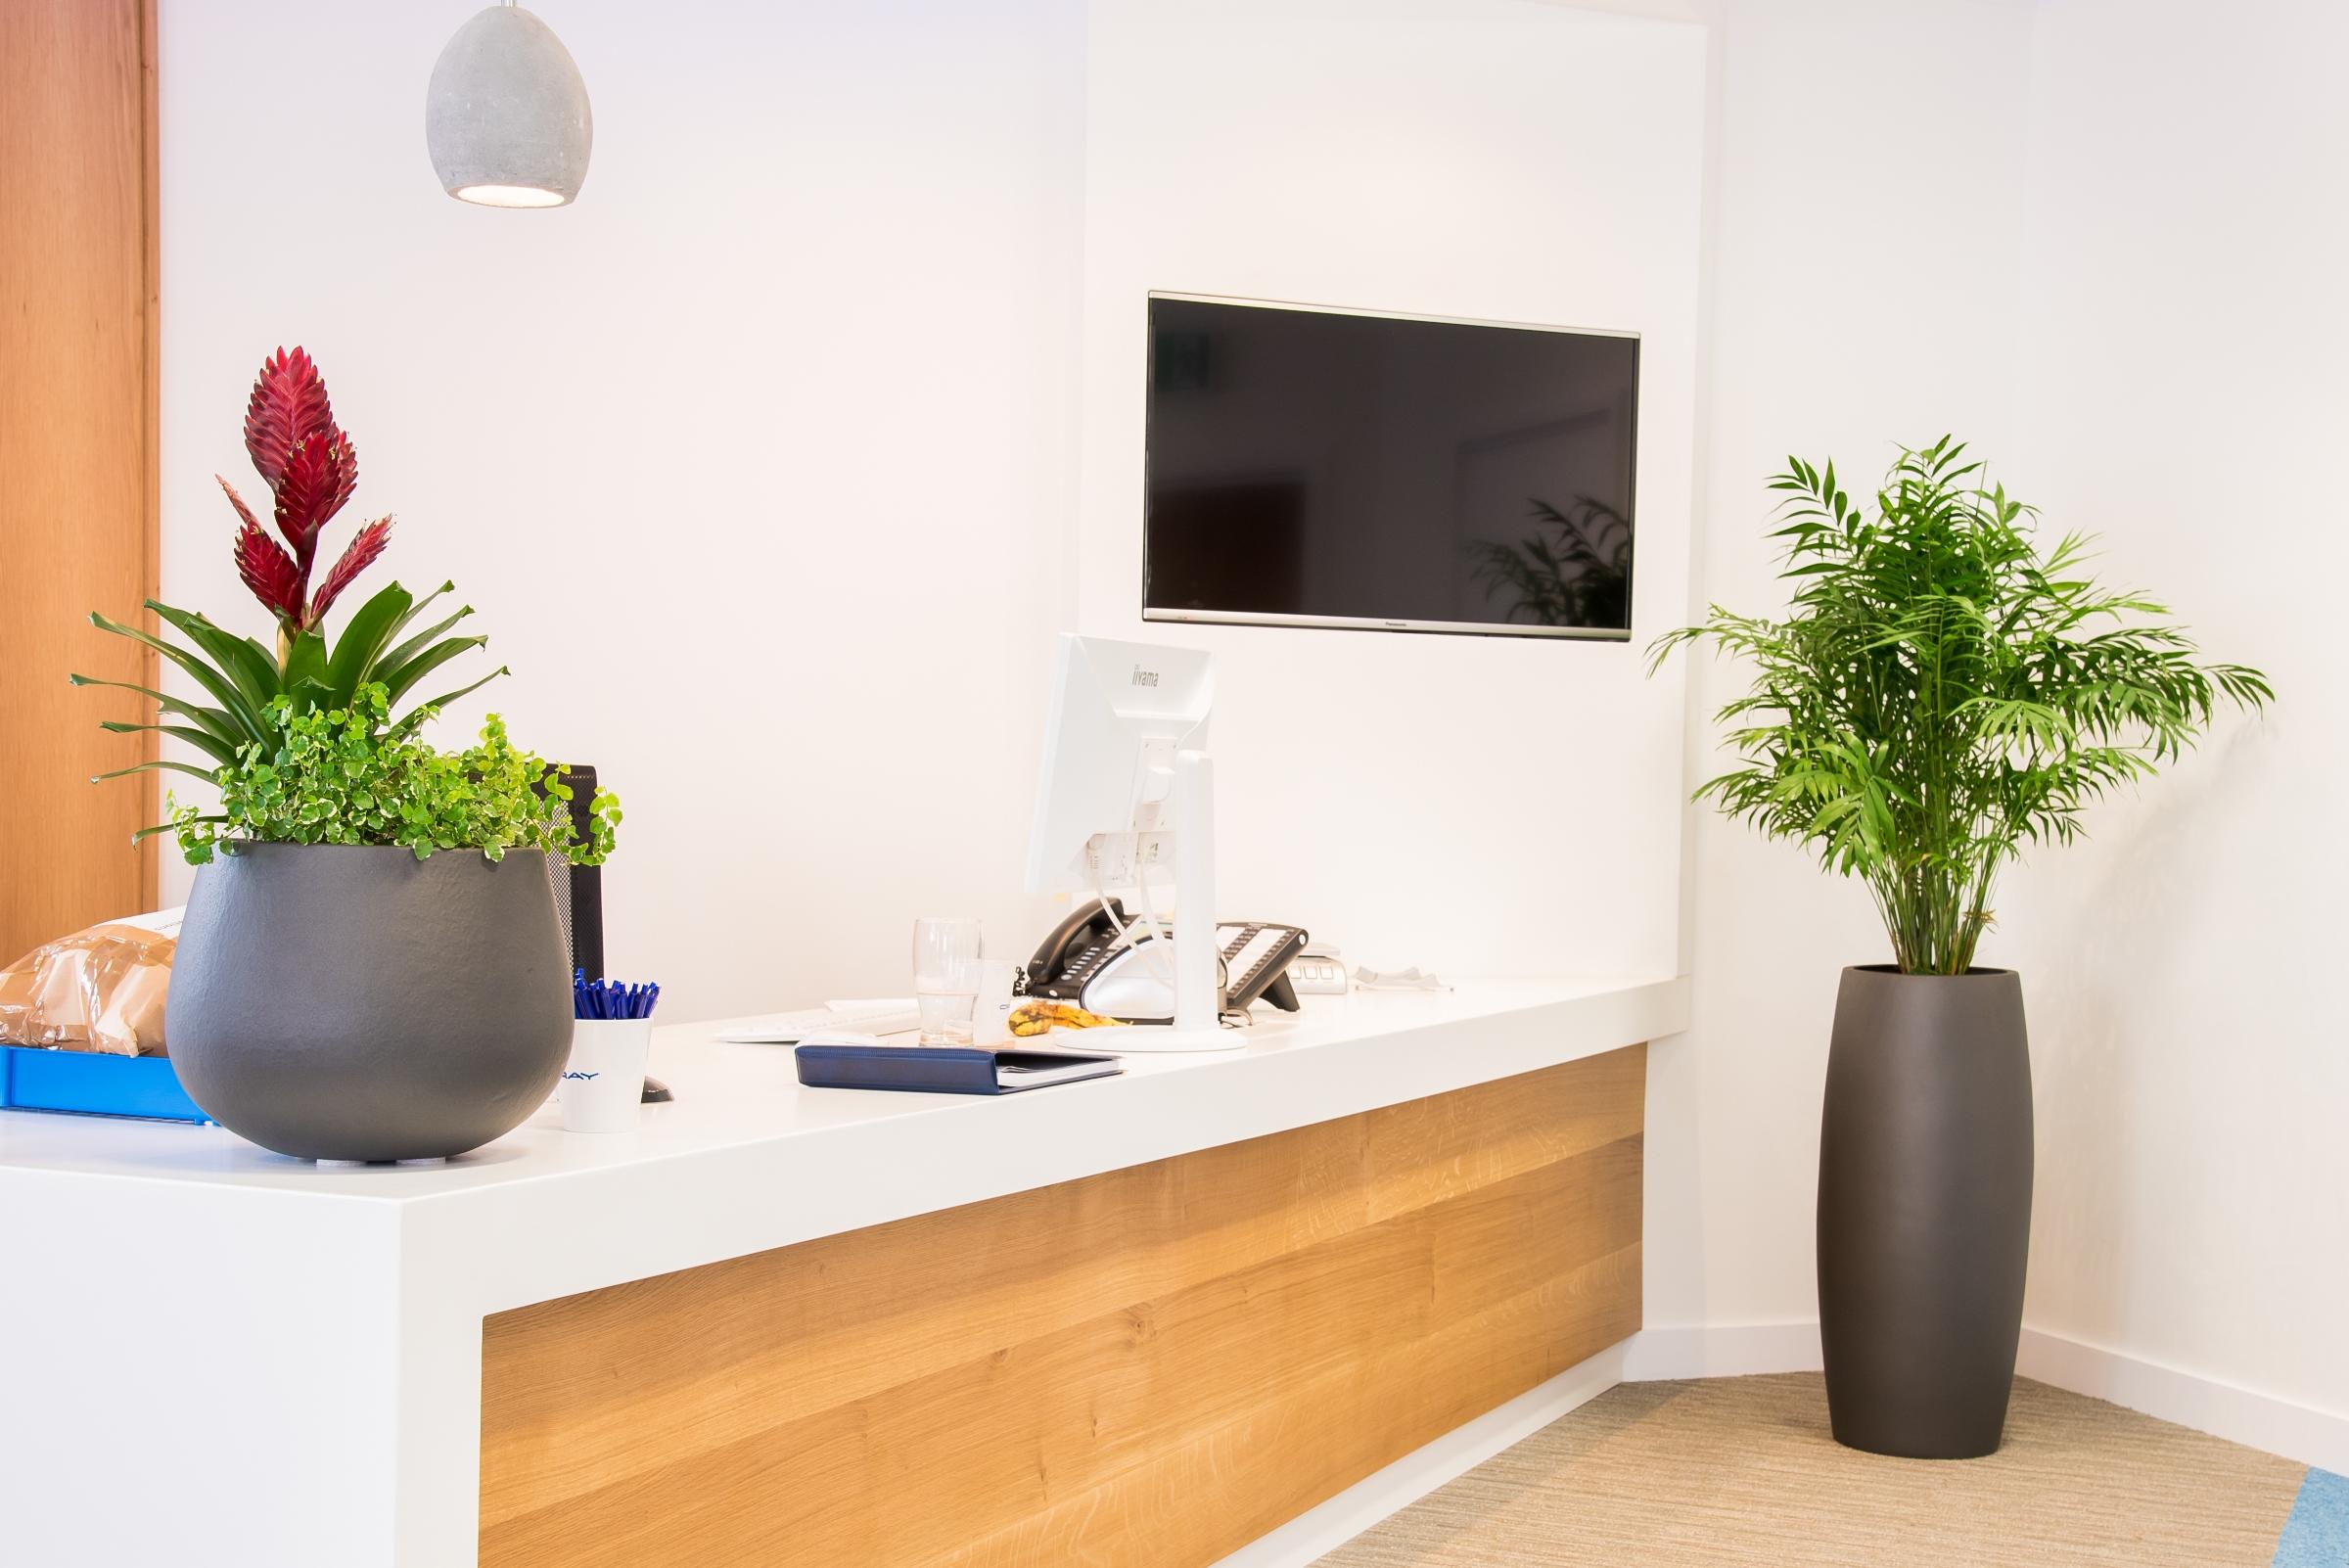 office-plants-rent-maintain-plants.jpg